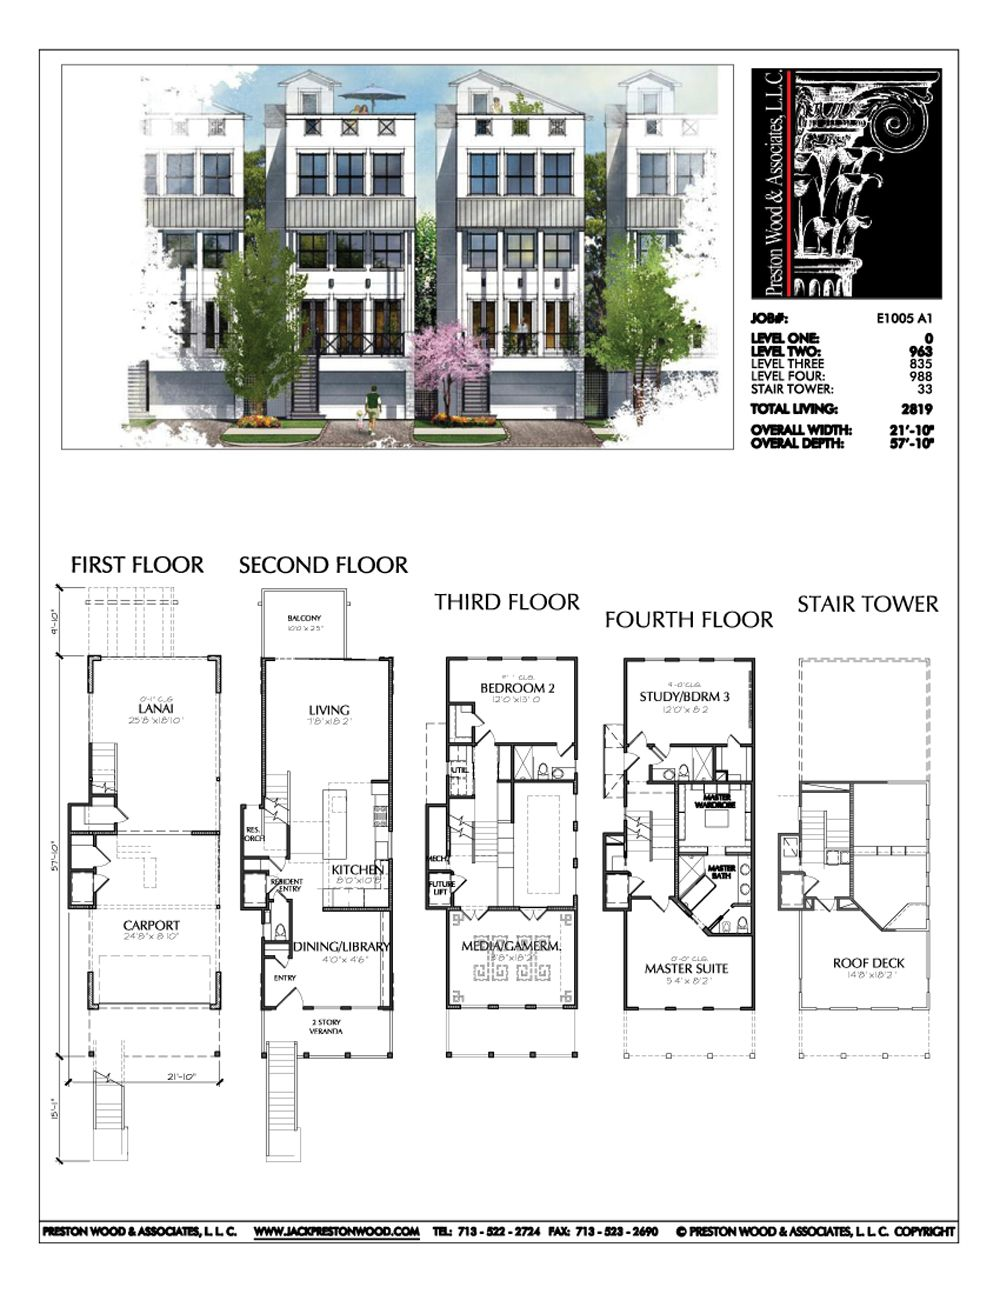 Townhouse plan e1005 a1 master bedroom keziah bedroom 3 for 2 bedroom townhouse floor plans